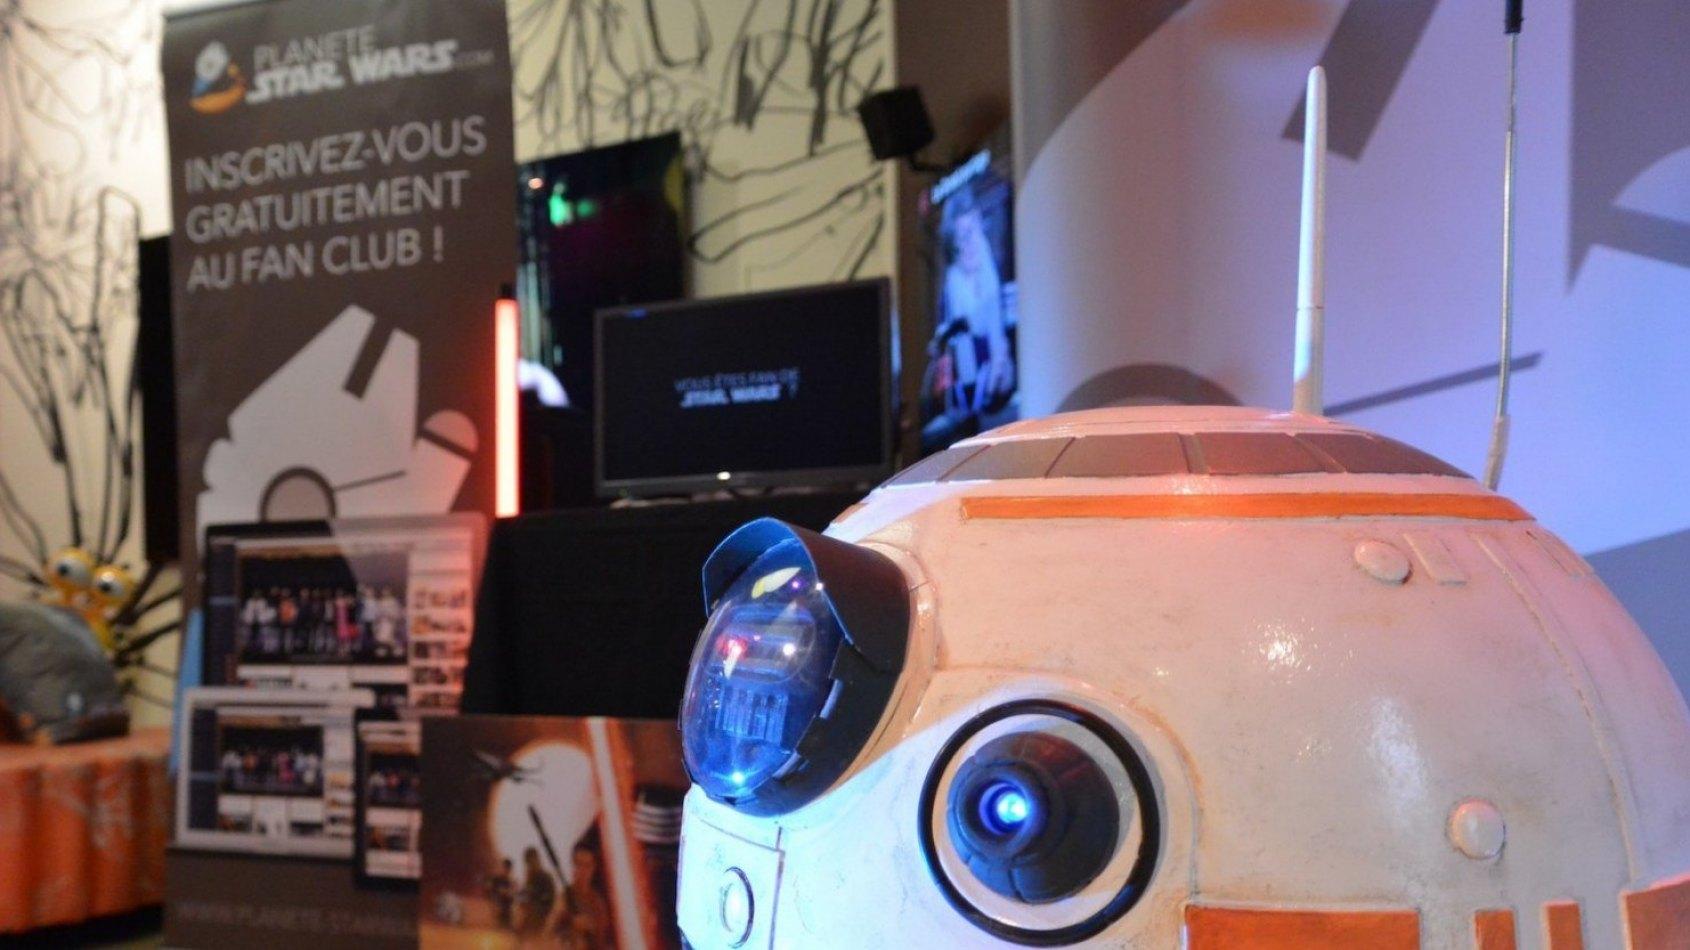 Plan�te Star Wars � la Paris Comics Expo !